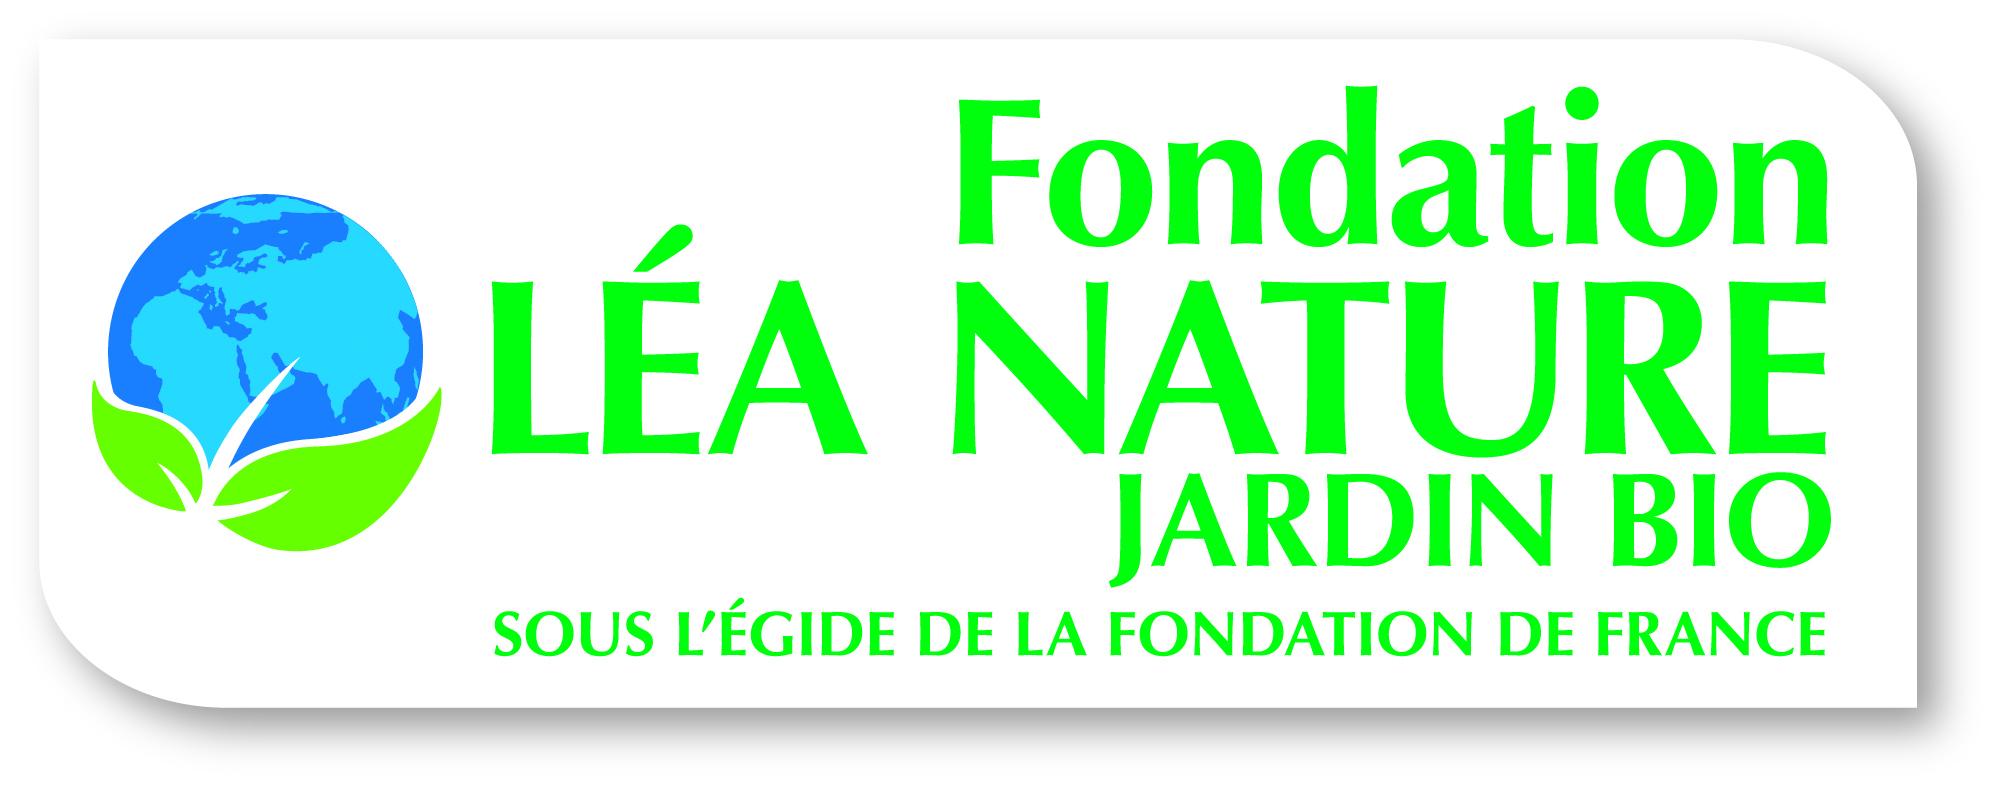 New_Logo_Fondation_LEA_NATURE_JB_Bloc_QUADRI_1.jpg